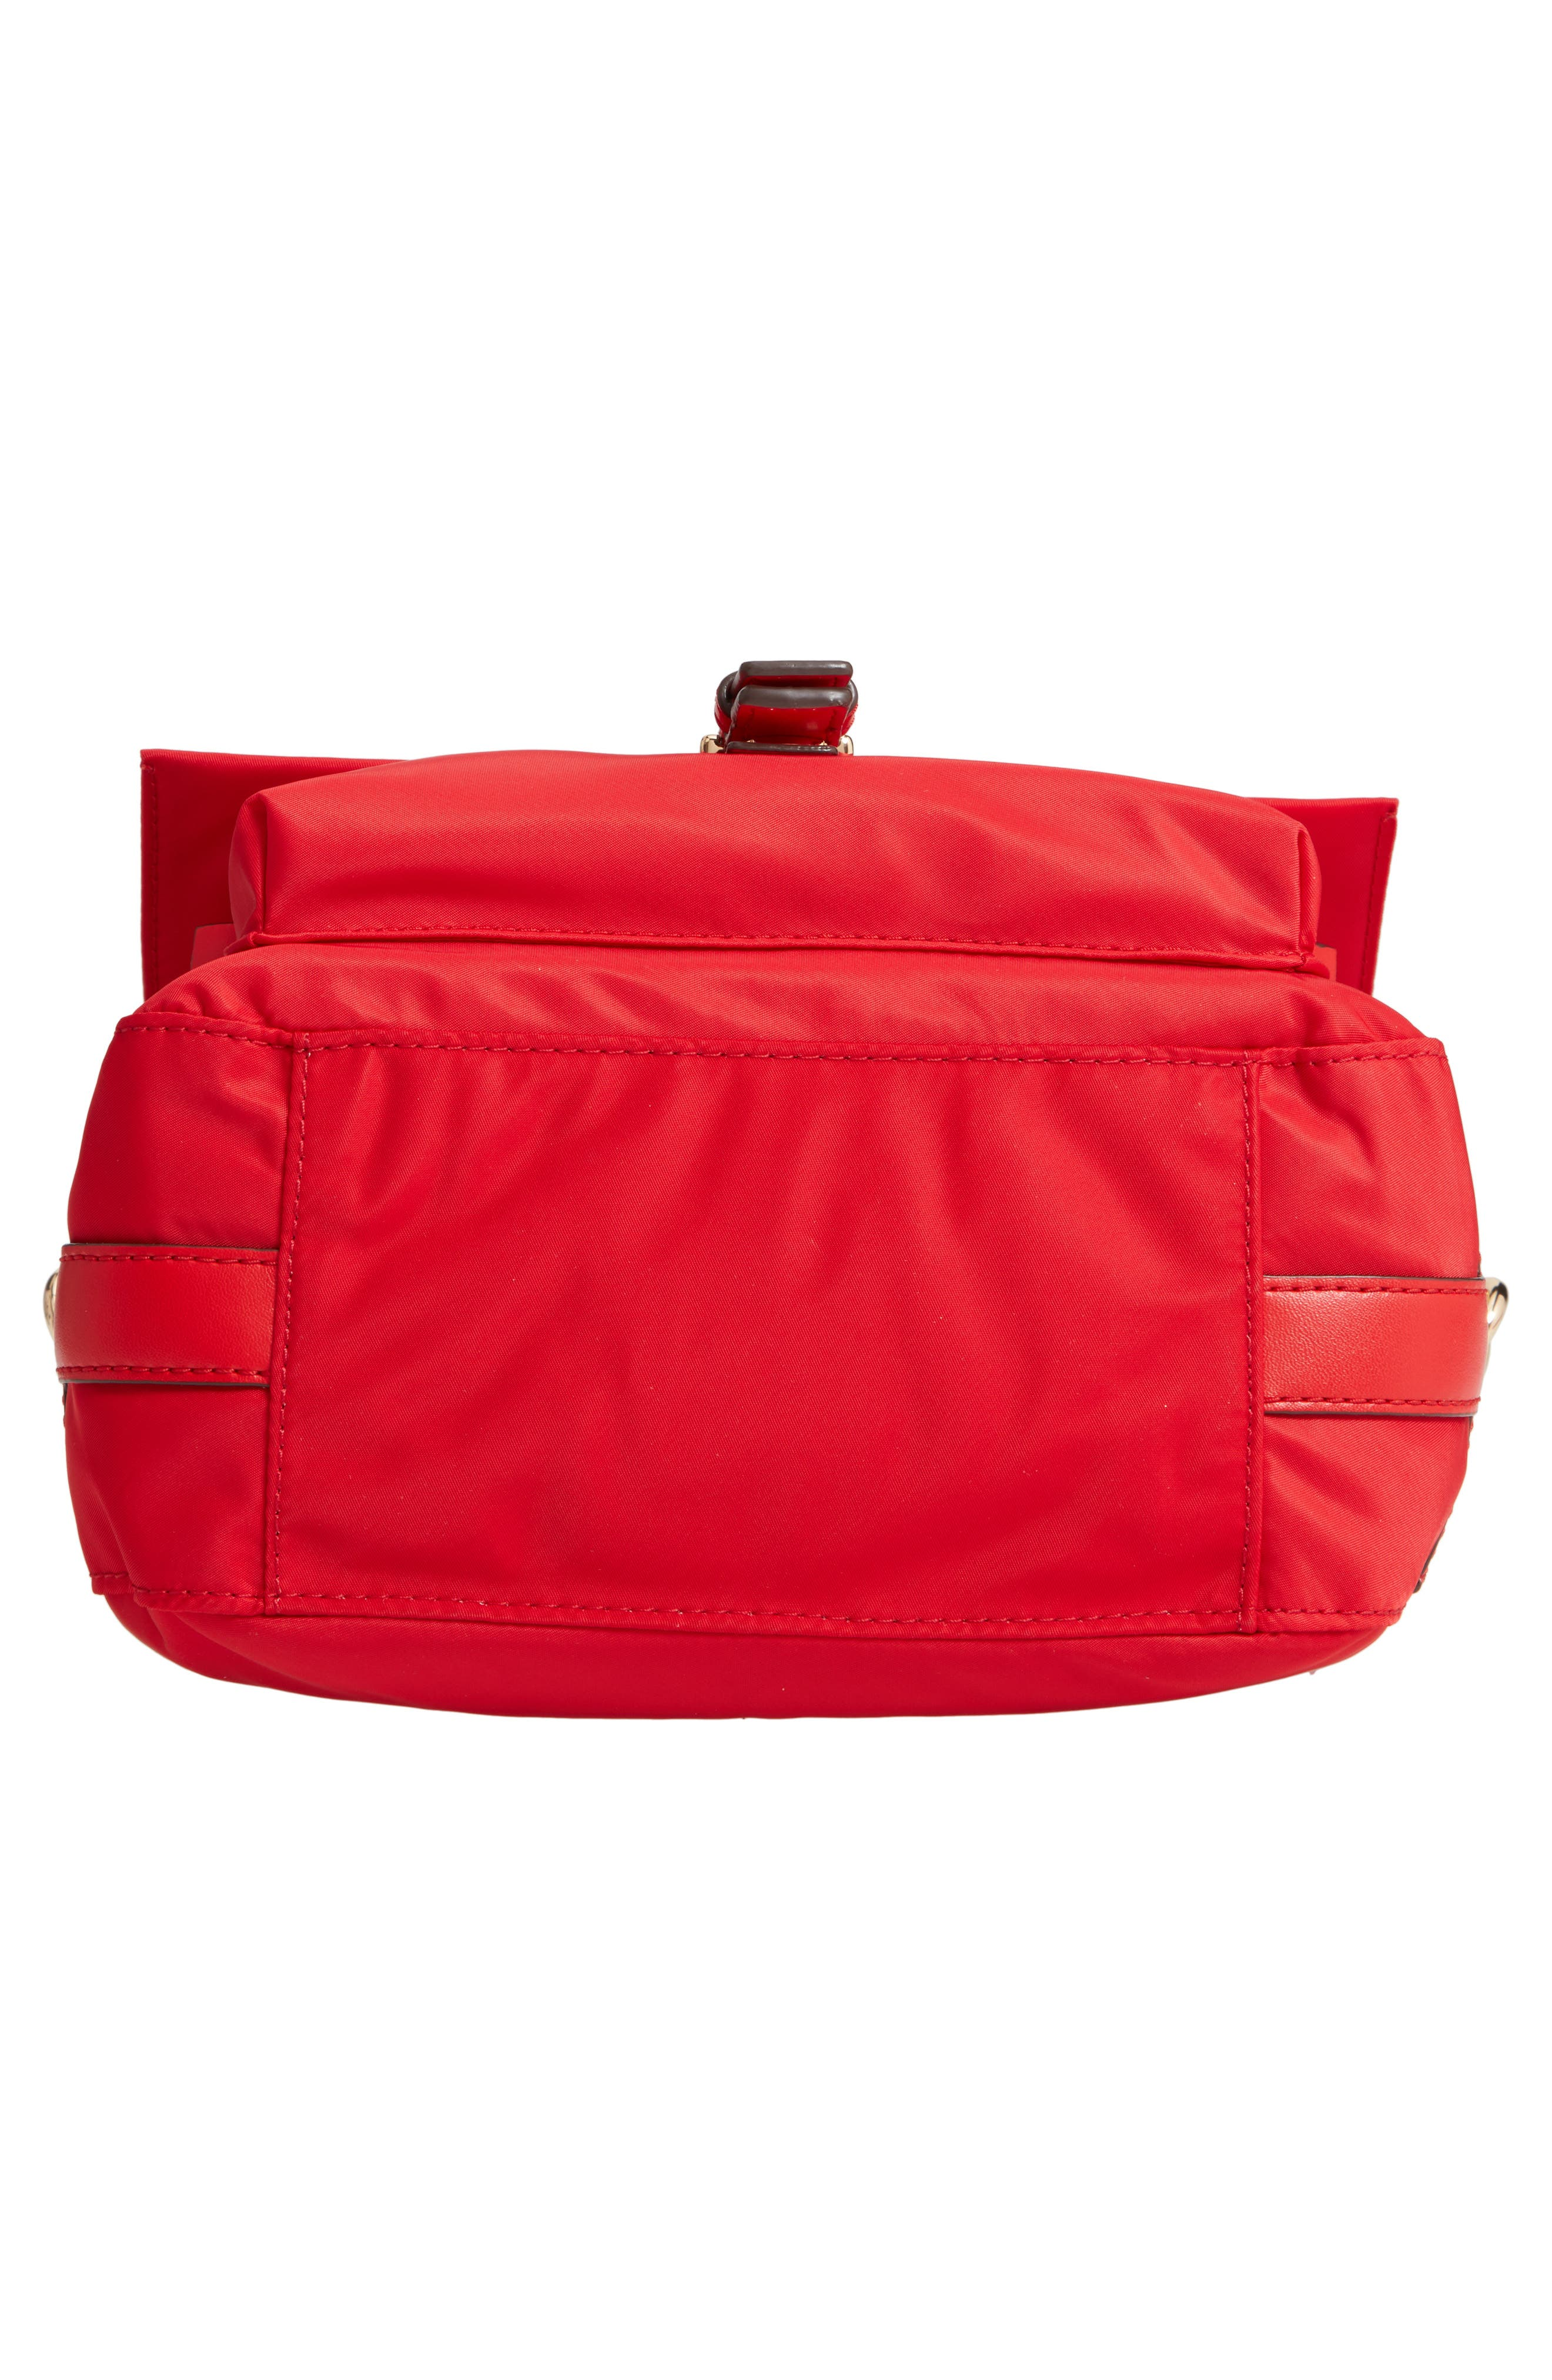 Tilda Nylon Crossbody Bag,                             Alternate thumbnail 7, color,                             BRILLIANT RED